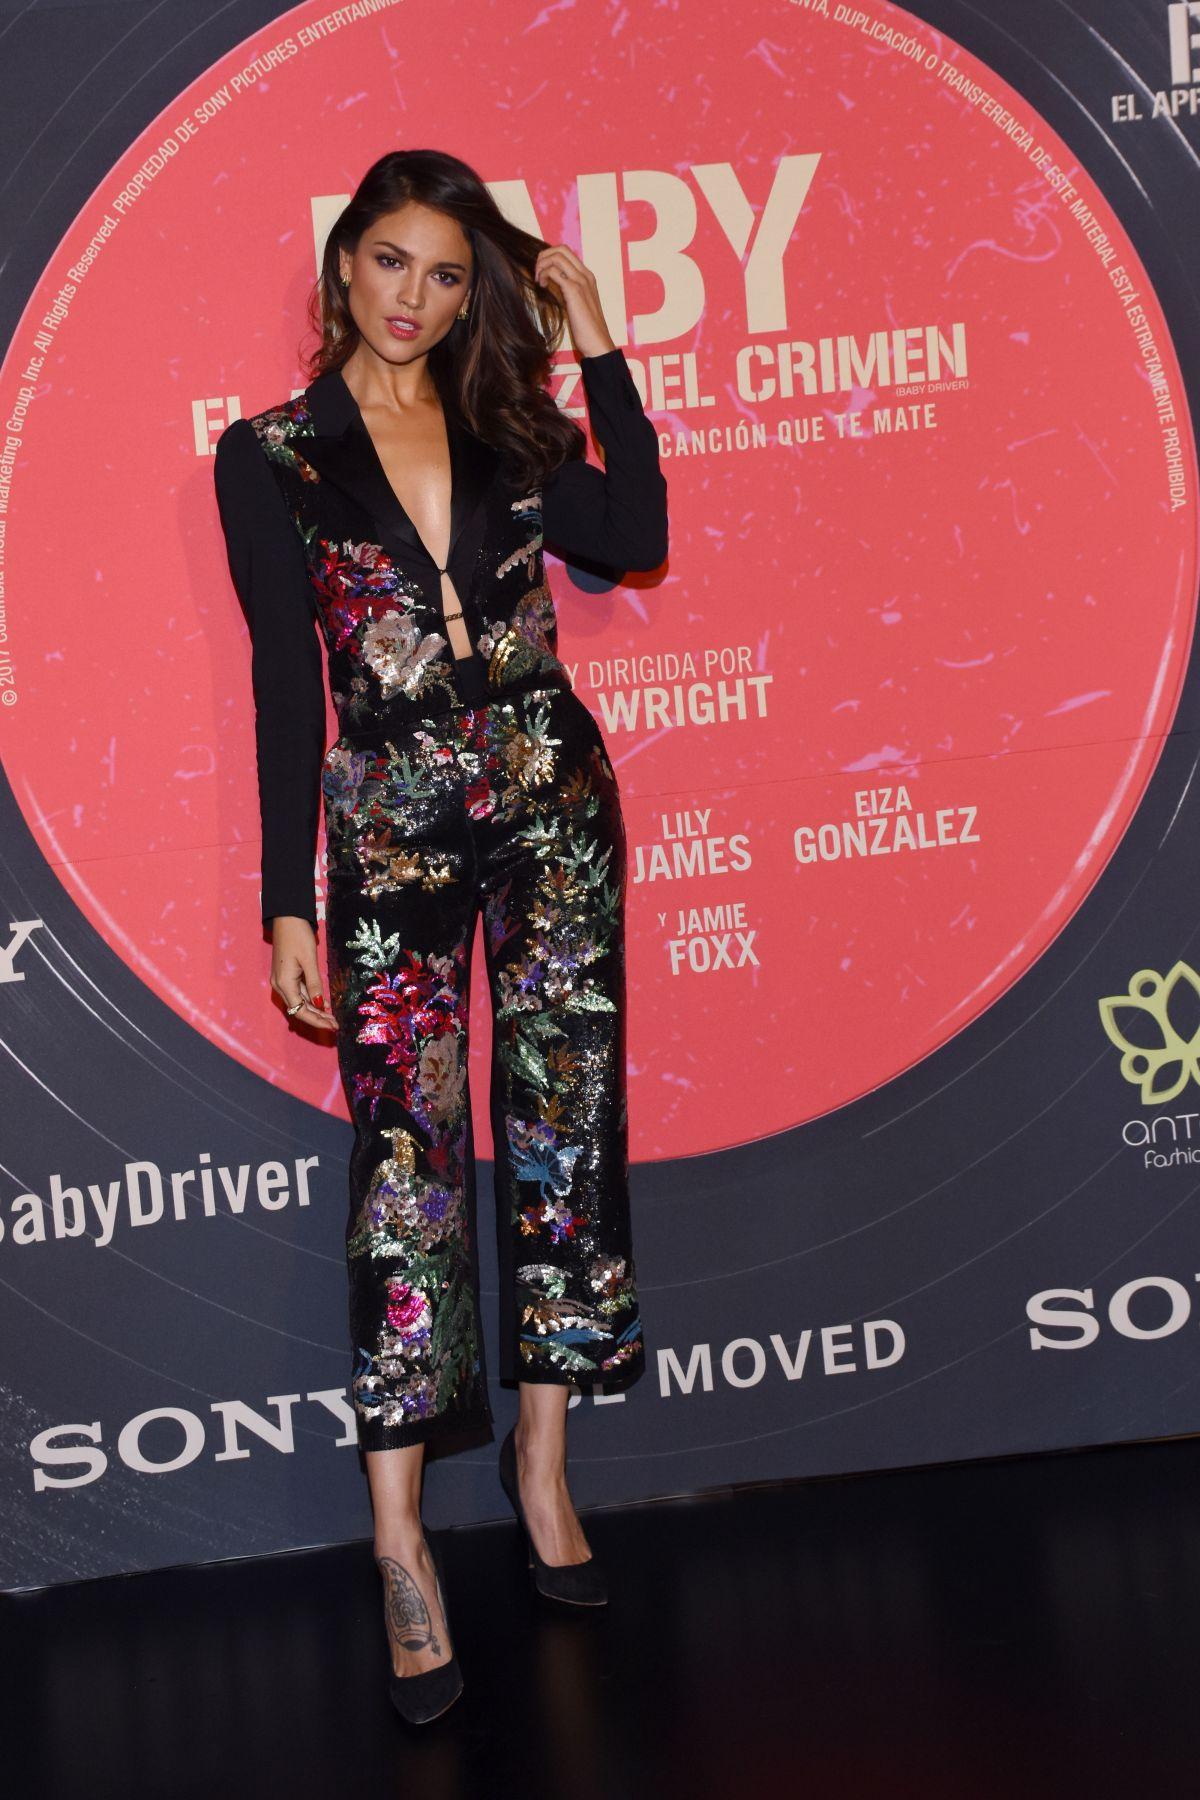 Eiza gonzalez tristar pictures baby driver premiere at sxsw festival in austin new pictures